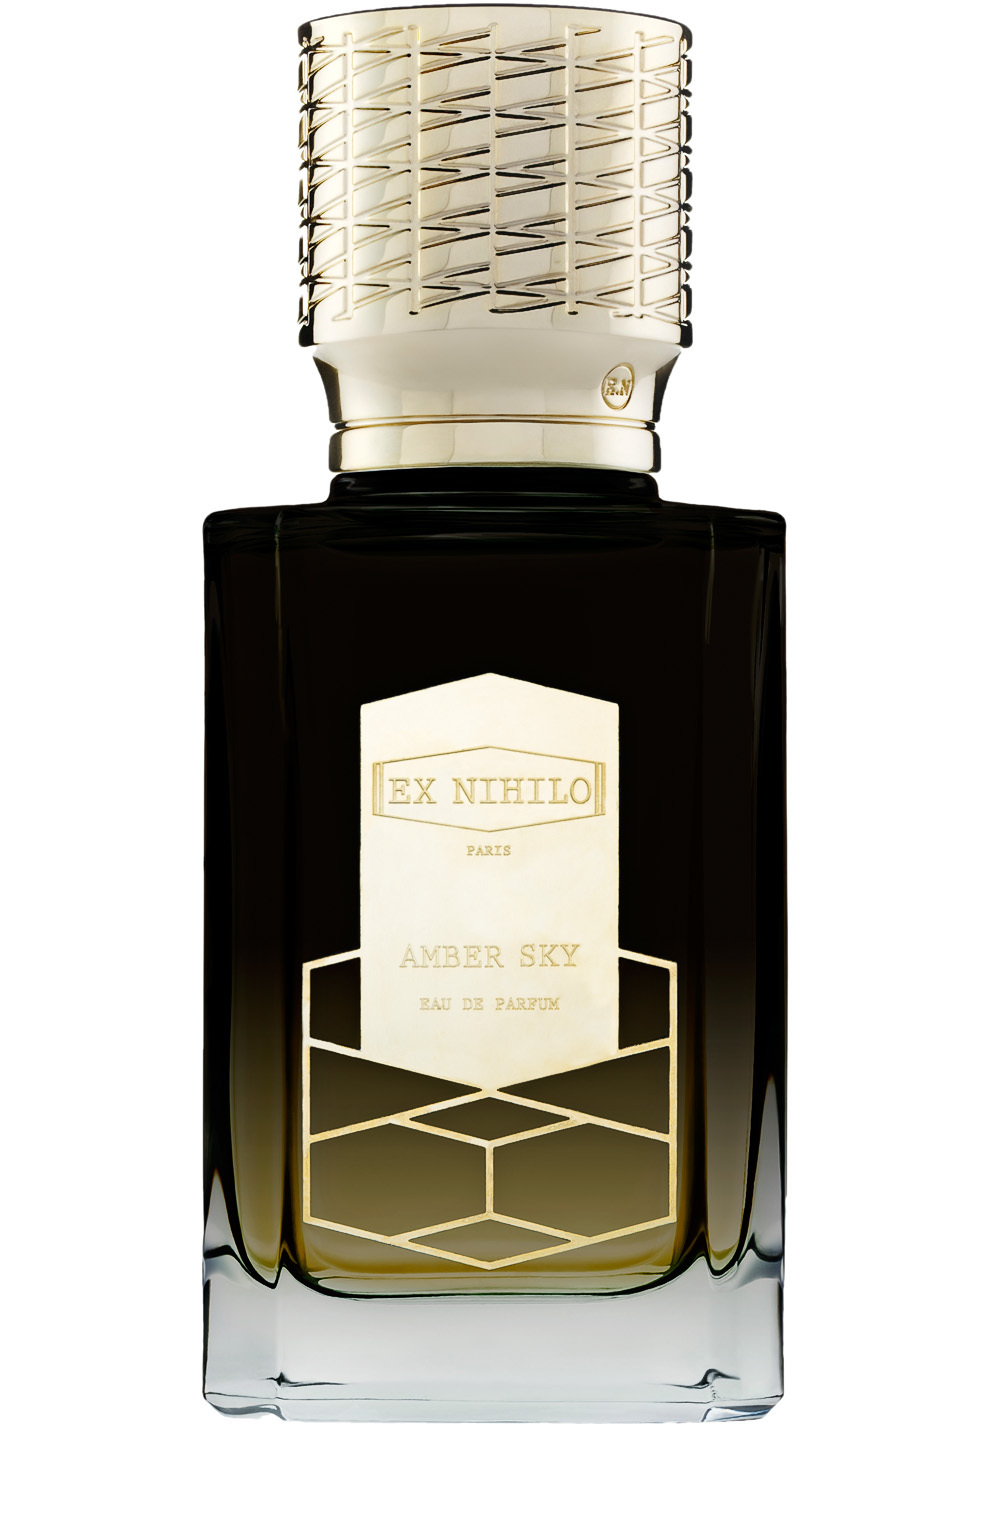 AMBER SKY by EX NIHILO 5ml Travel Spray Perfume CORIANDER GERANIUM VANILLA